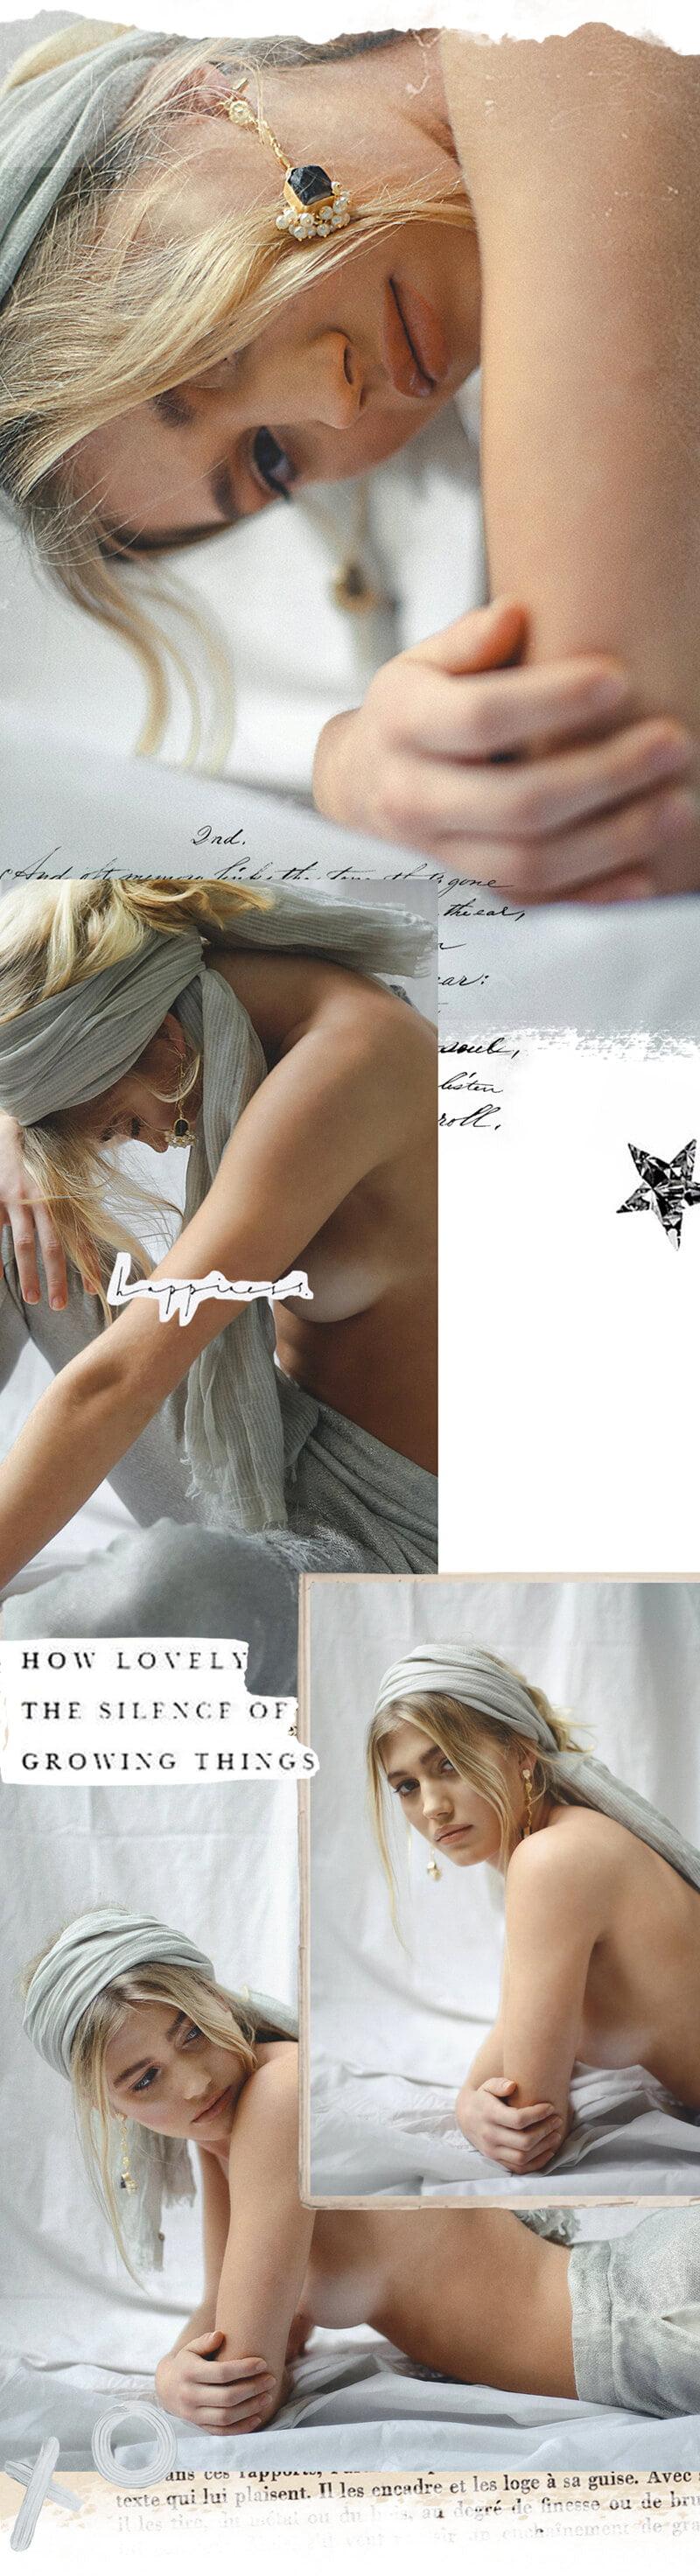 Interview Calexico Fashion Photographer Australia | Fashion Photographer Brisbane | High Fashion Photoshoot | Merci for Calexico Boutique | Model: Greta Hampson | Featured Designers: Transit, BA&SH, Alexis, Faliero Sarti, Arabella Rocha Jewellery